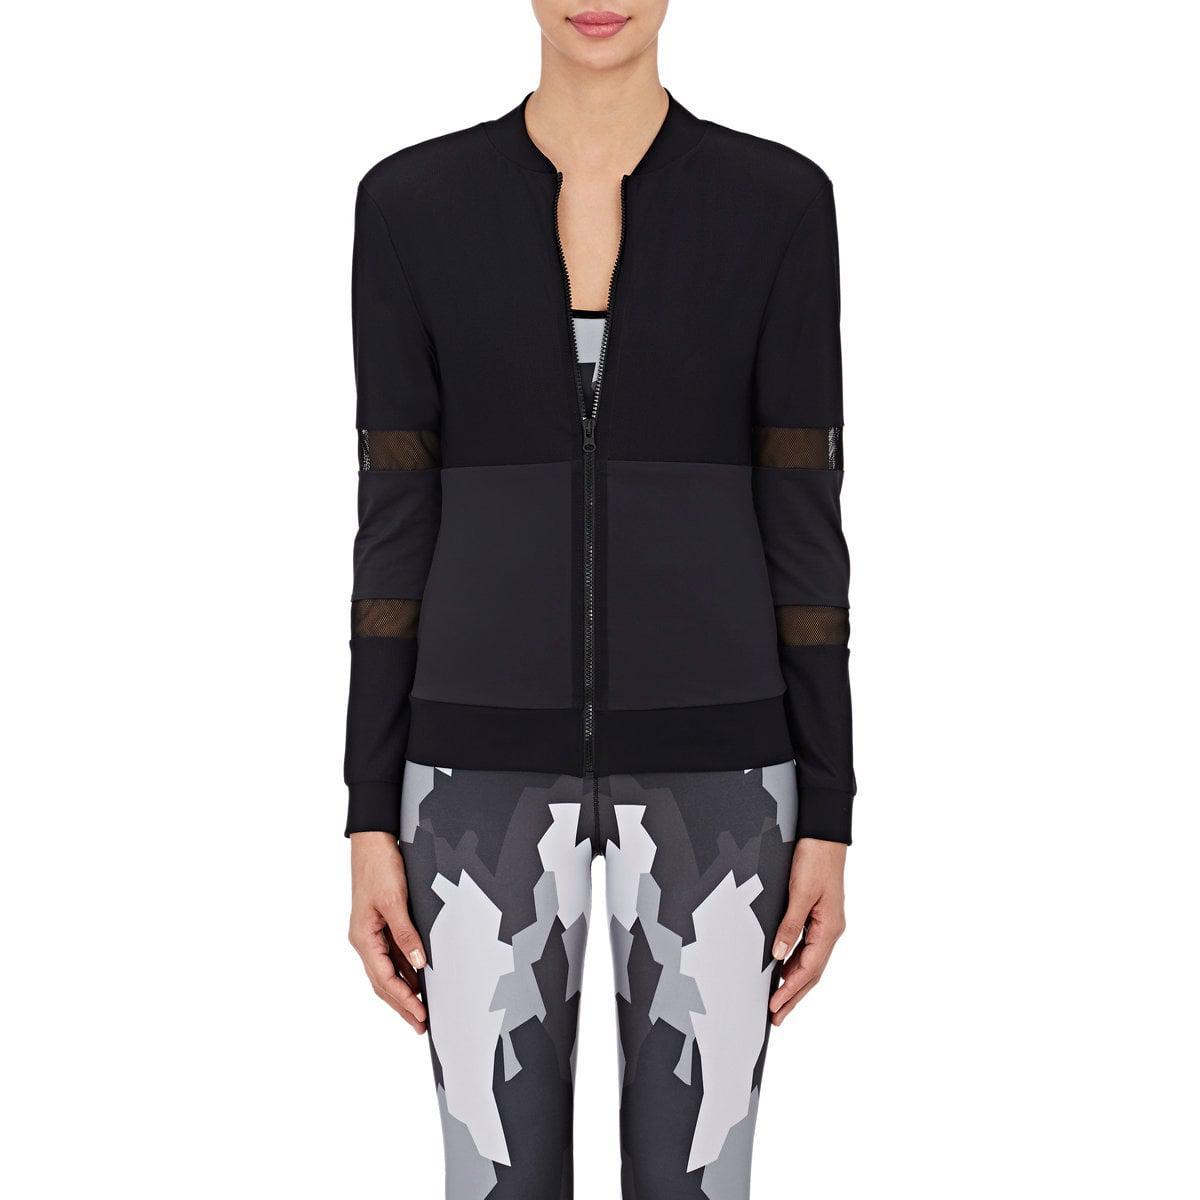 lyst ultracor mesh microfiber performance jacket in black. Black Bedroom Furniture Sets. Home Design Ideas